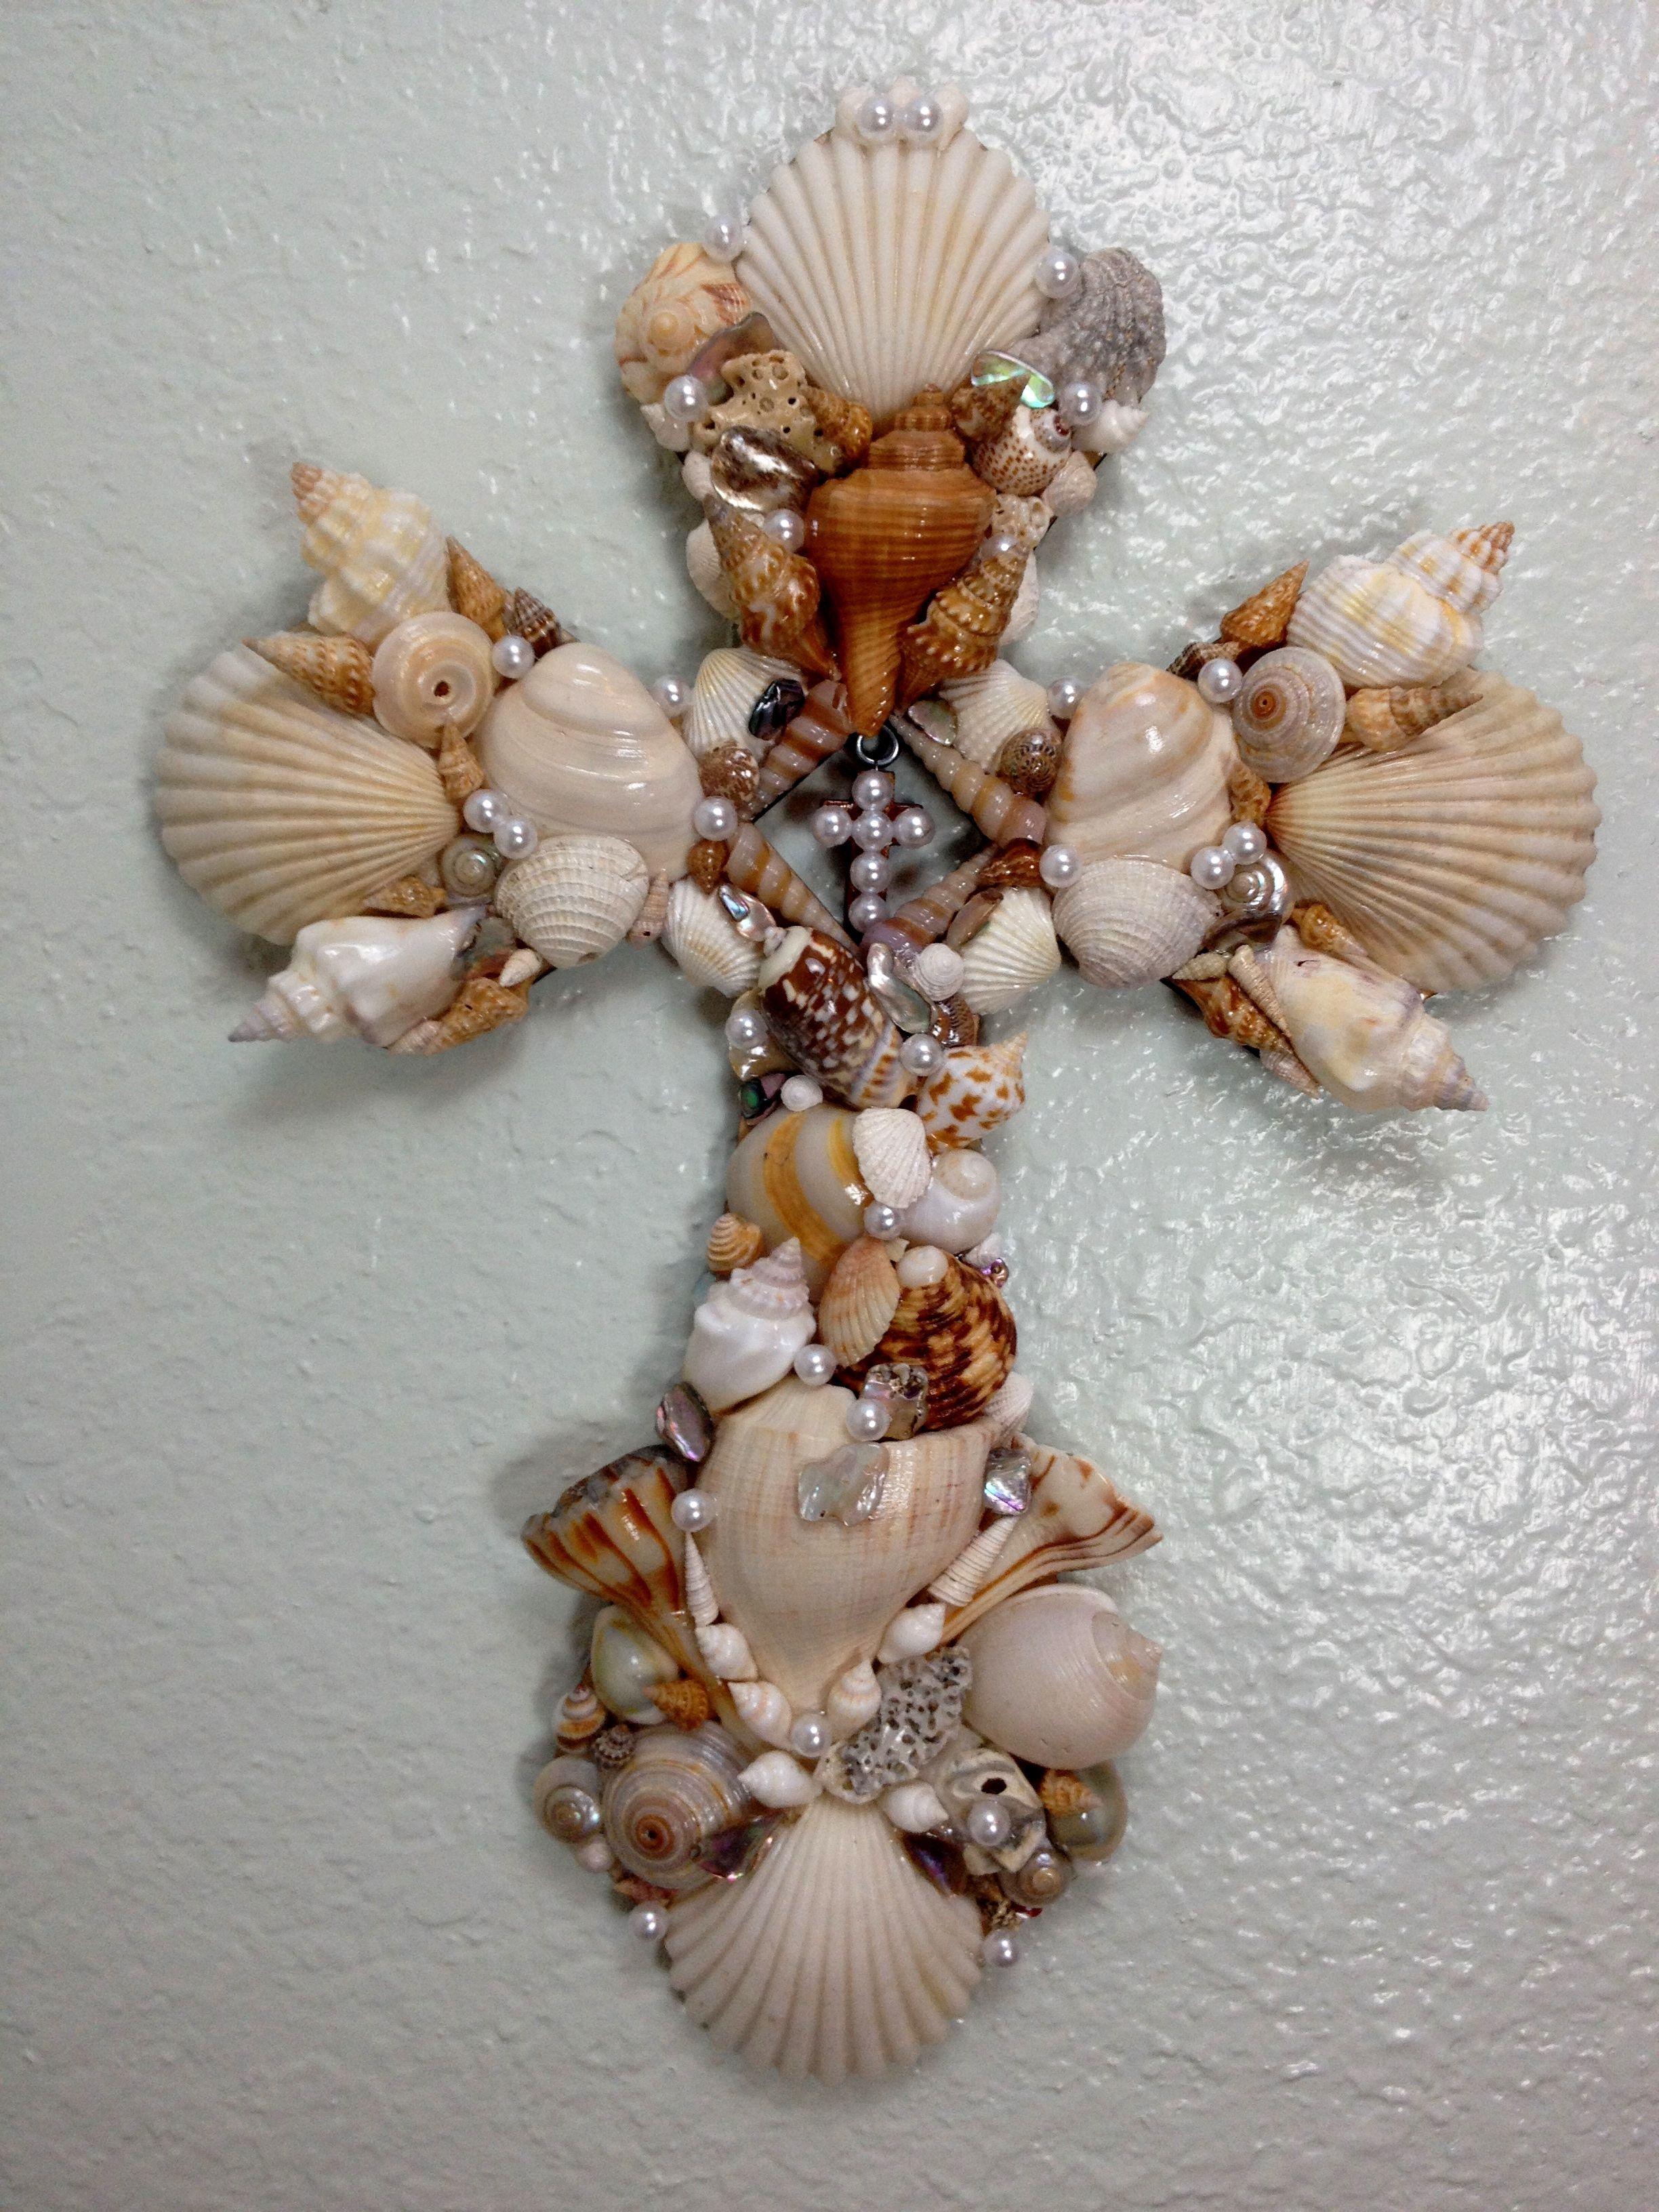 Shimmer Shells Cross Sold My Seashell Crafts Pinterest Shell Shell Art And Craft